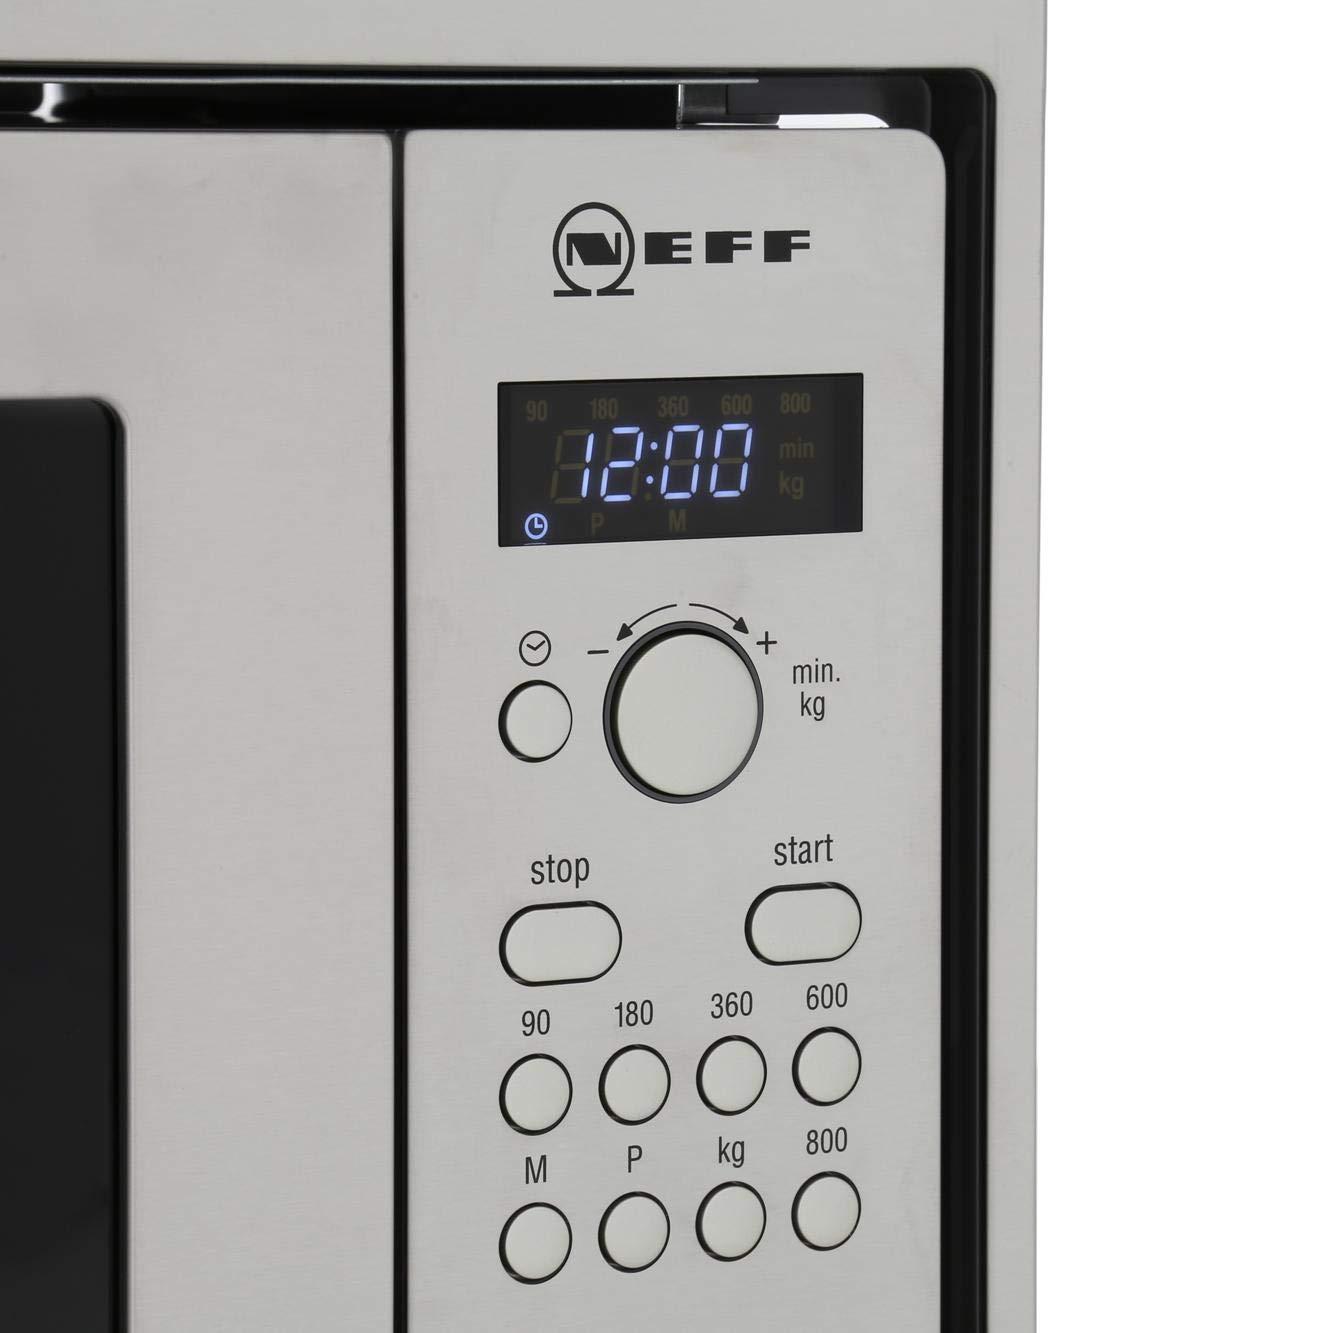 Neff H53W50N3GB Integrado 800W Acero inoxidable - Microondas ...